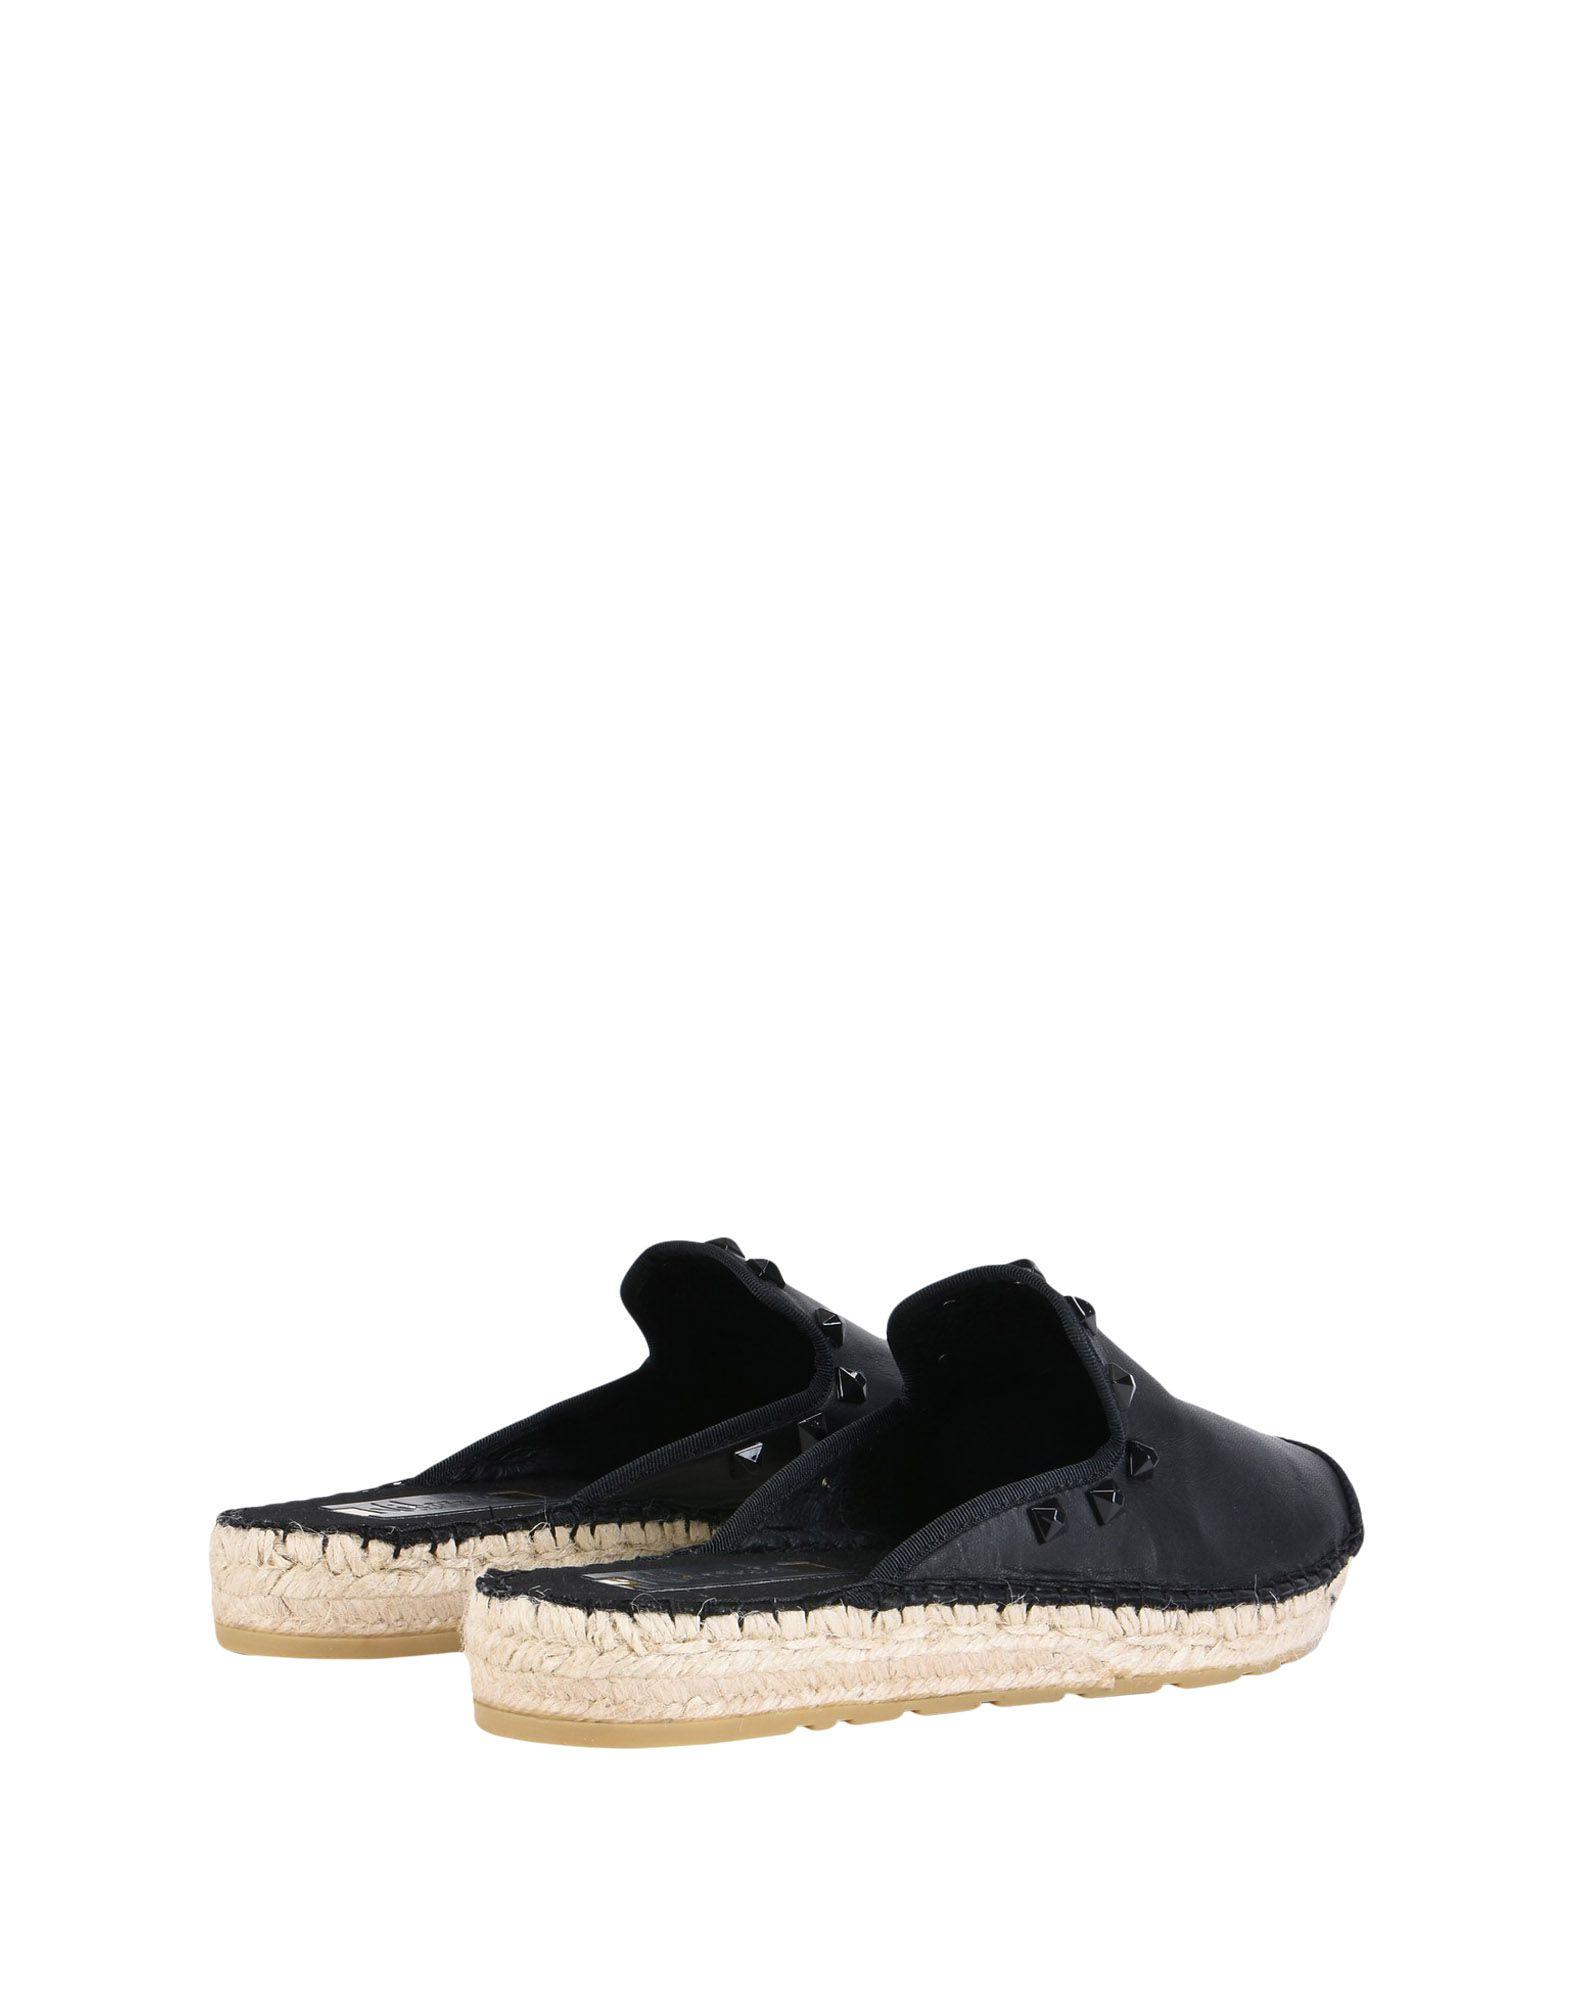 Vidorreta Gute Pantoletten Damen  11468724XT Gute Vidorreta Qualität beliebte Schuhe 4b94c9